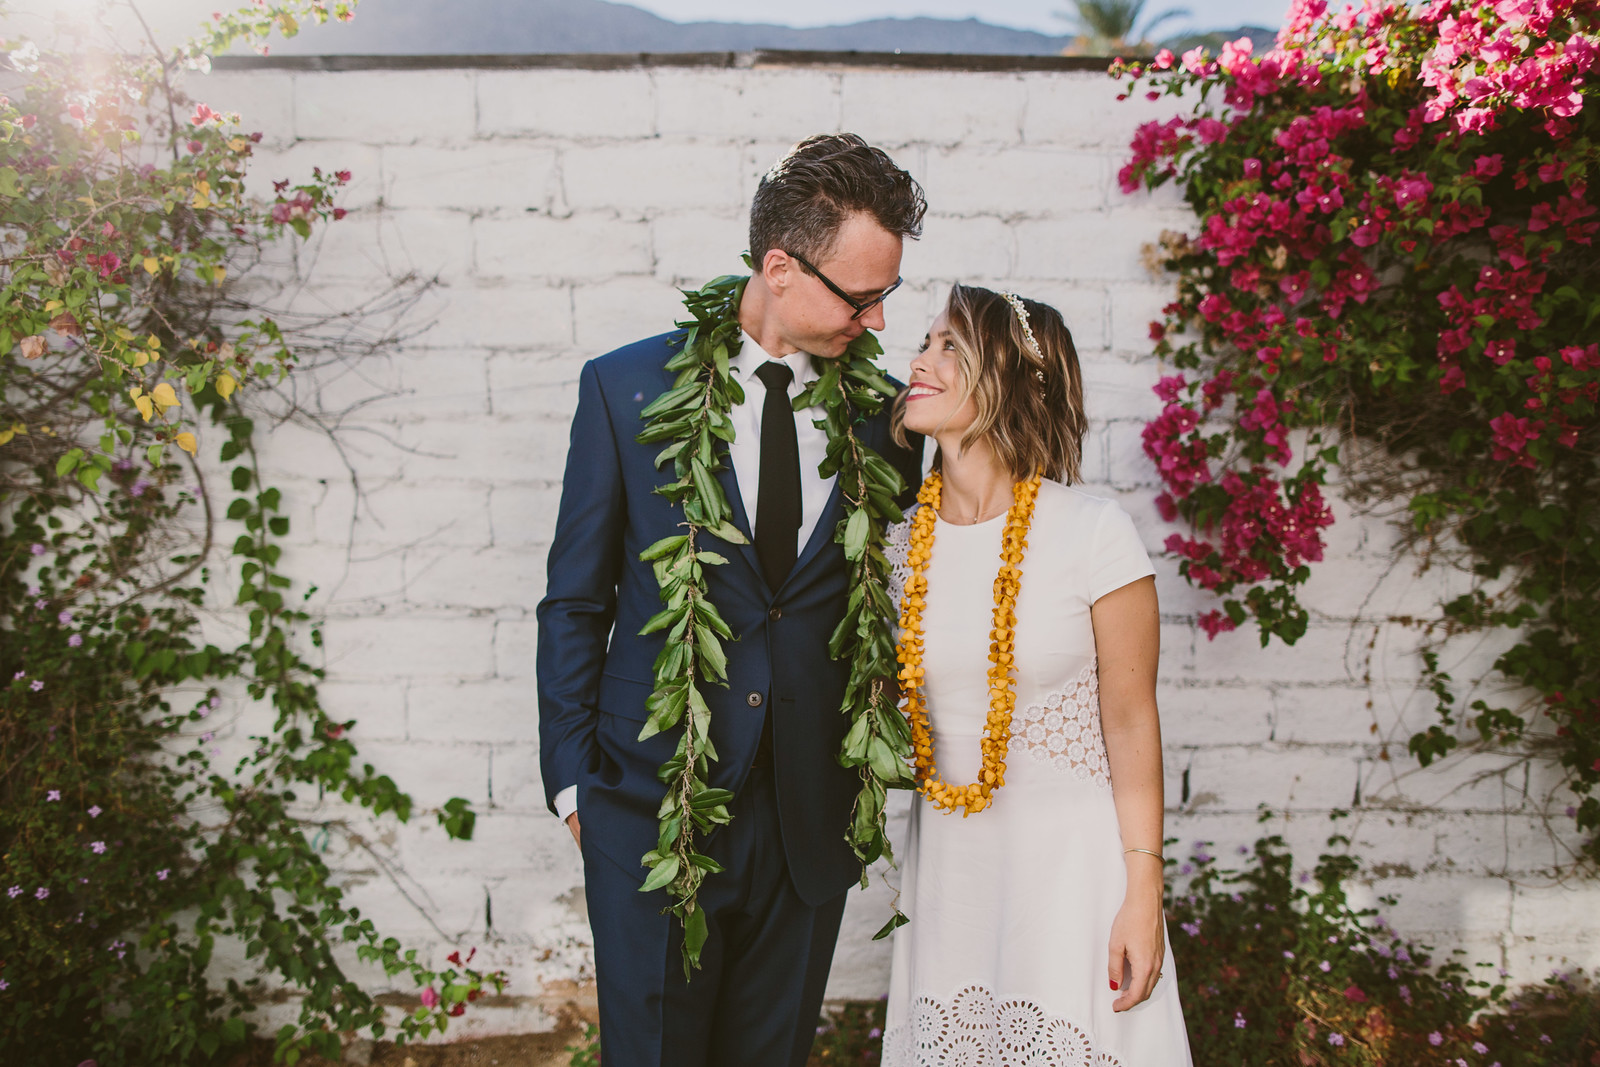 korakia-pensione-Wedding11.jpg